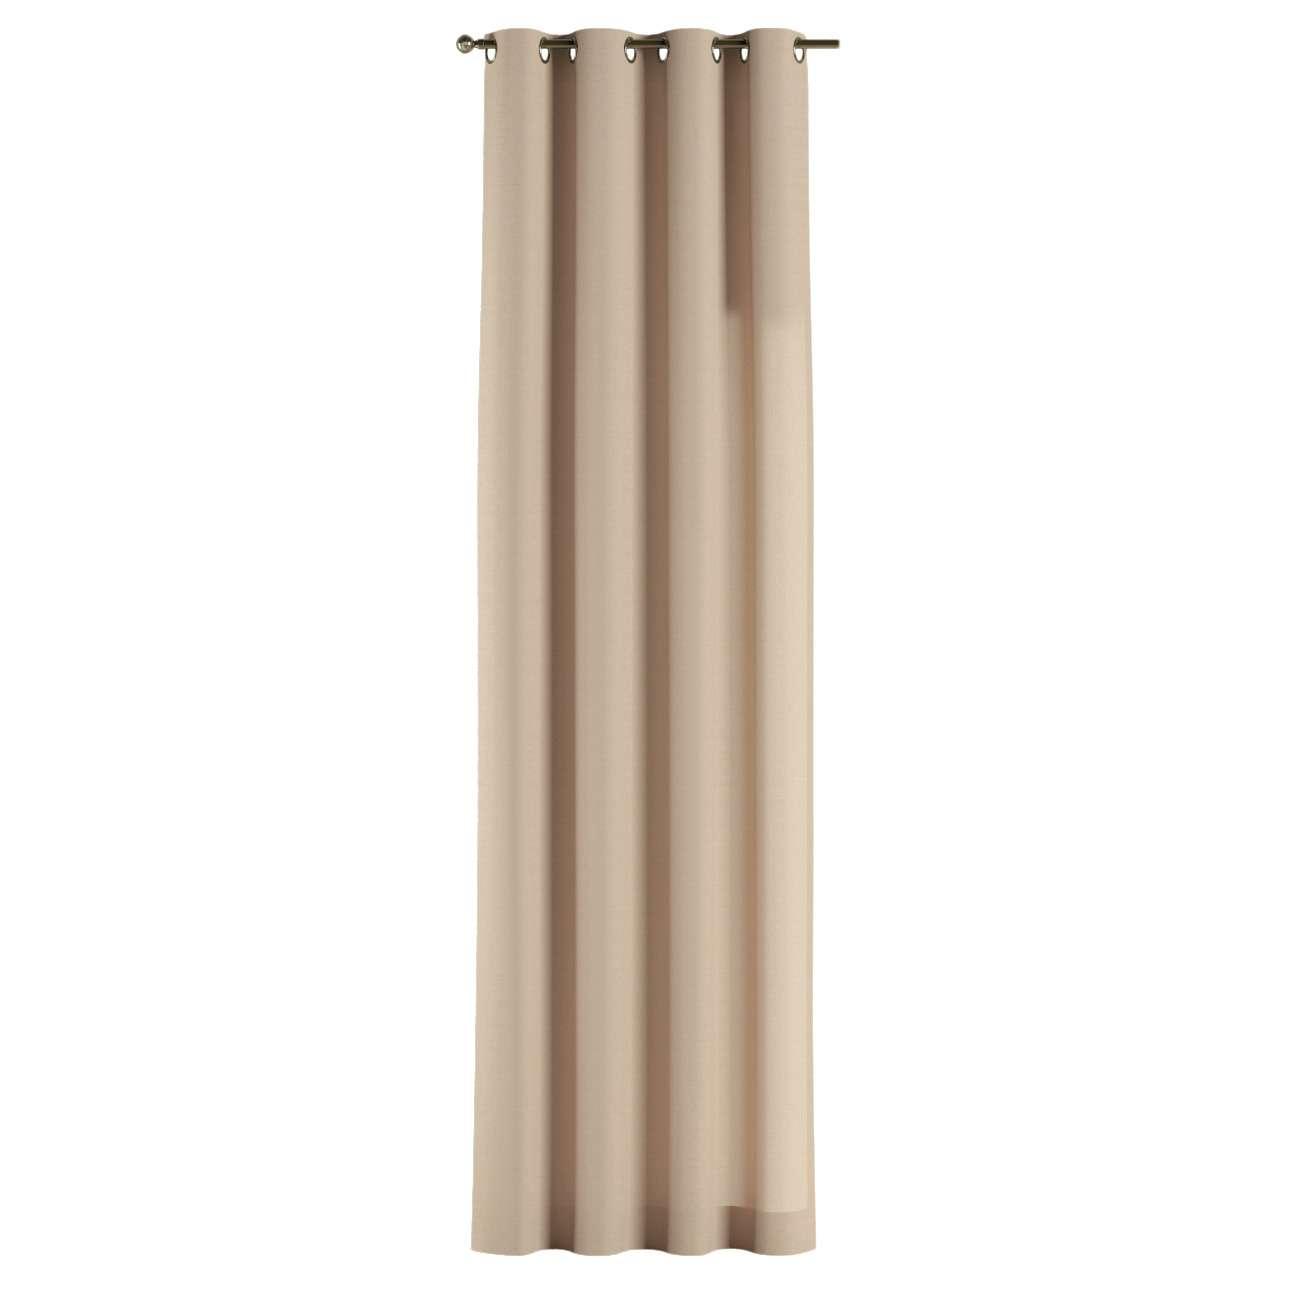 Gardin med öljetter 1 längd 130 x 260 cm i kollektionen Panama Cotton , Tyg: 702-01